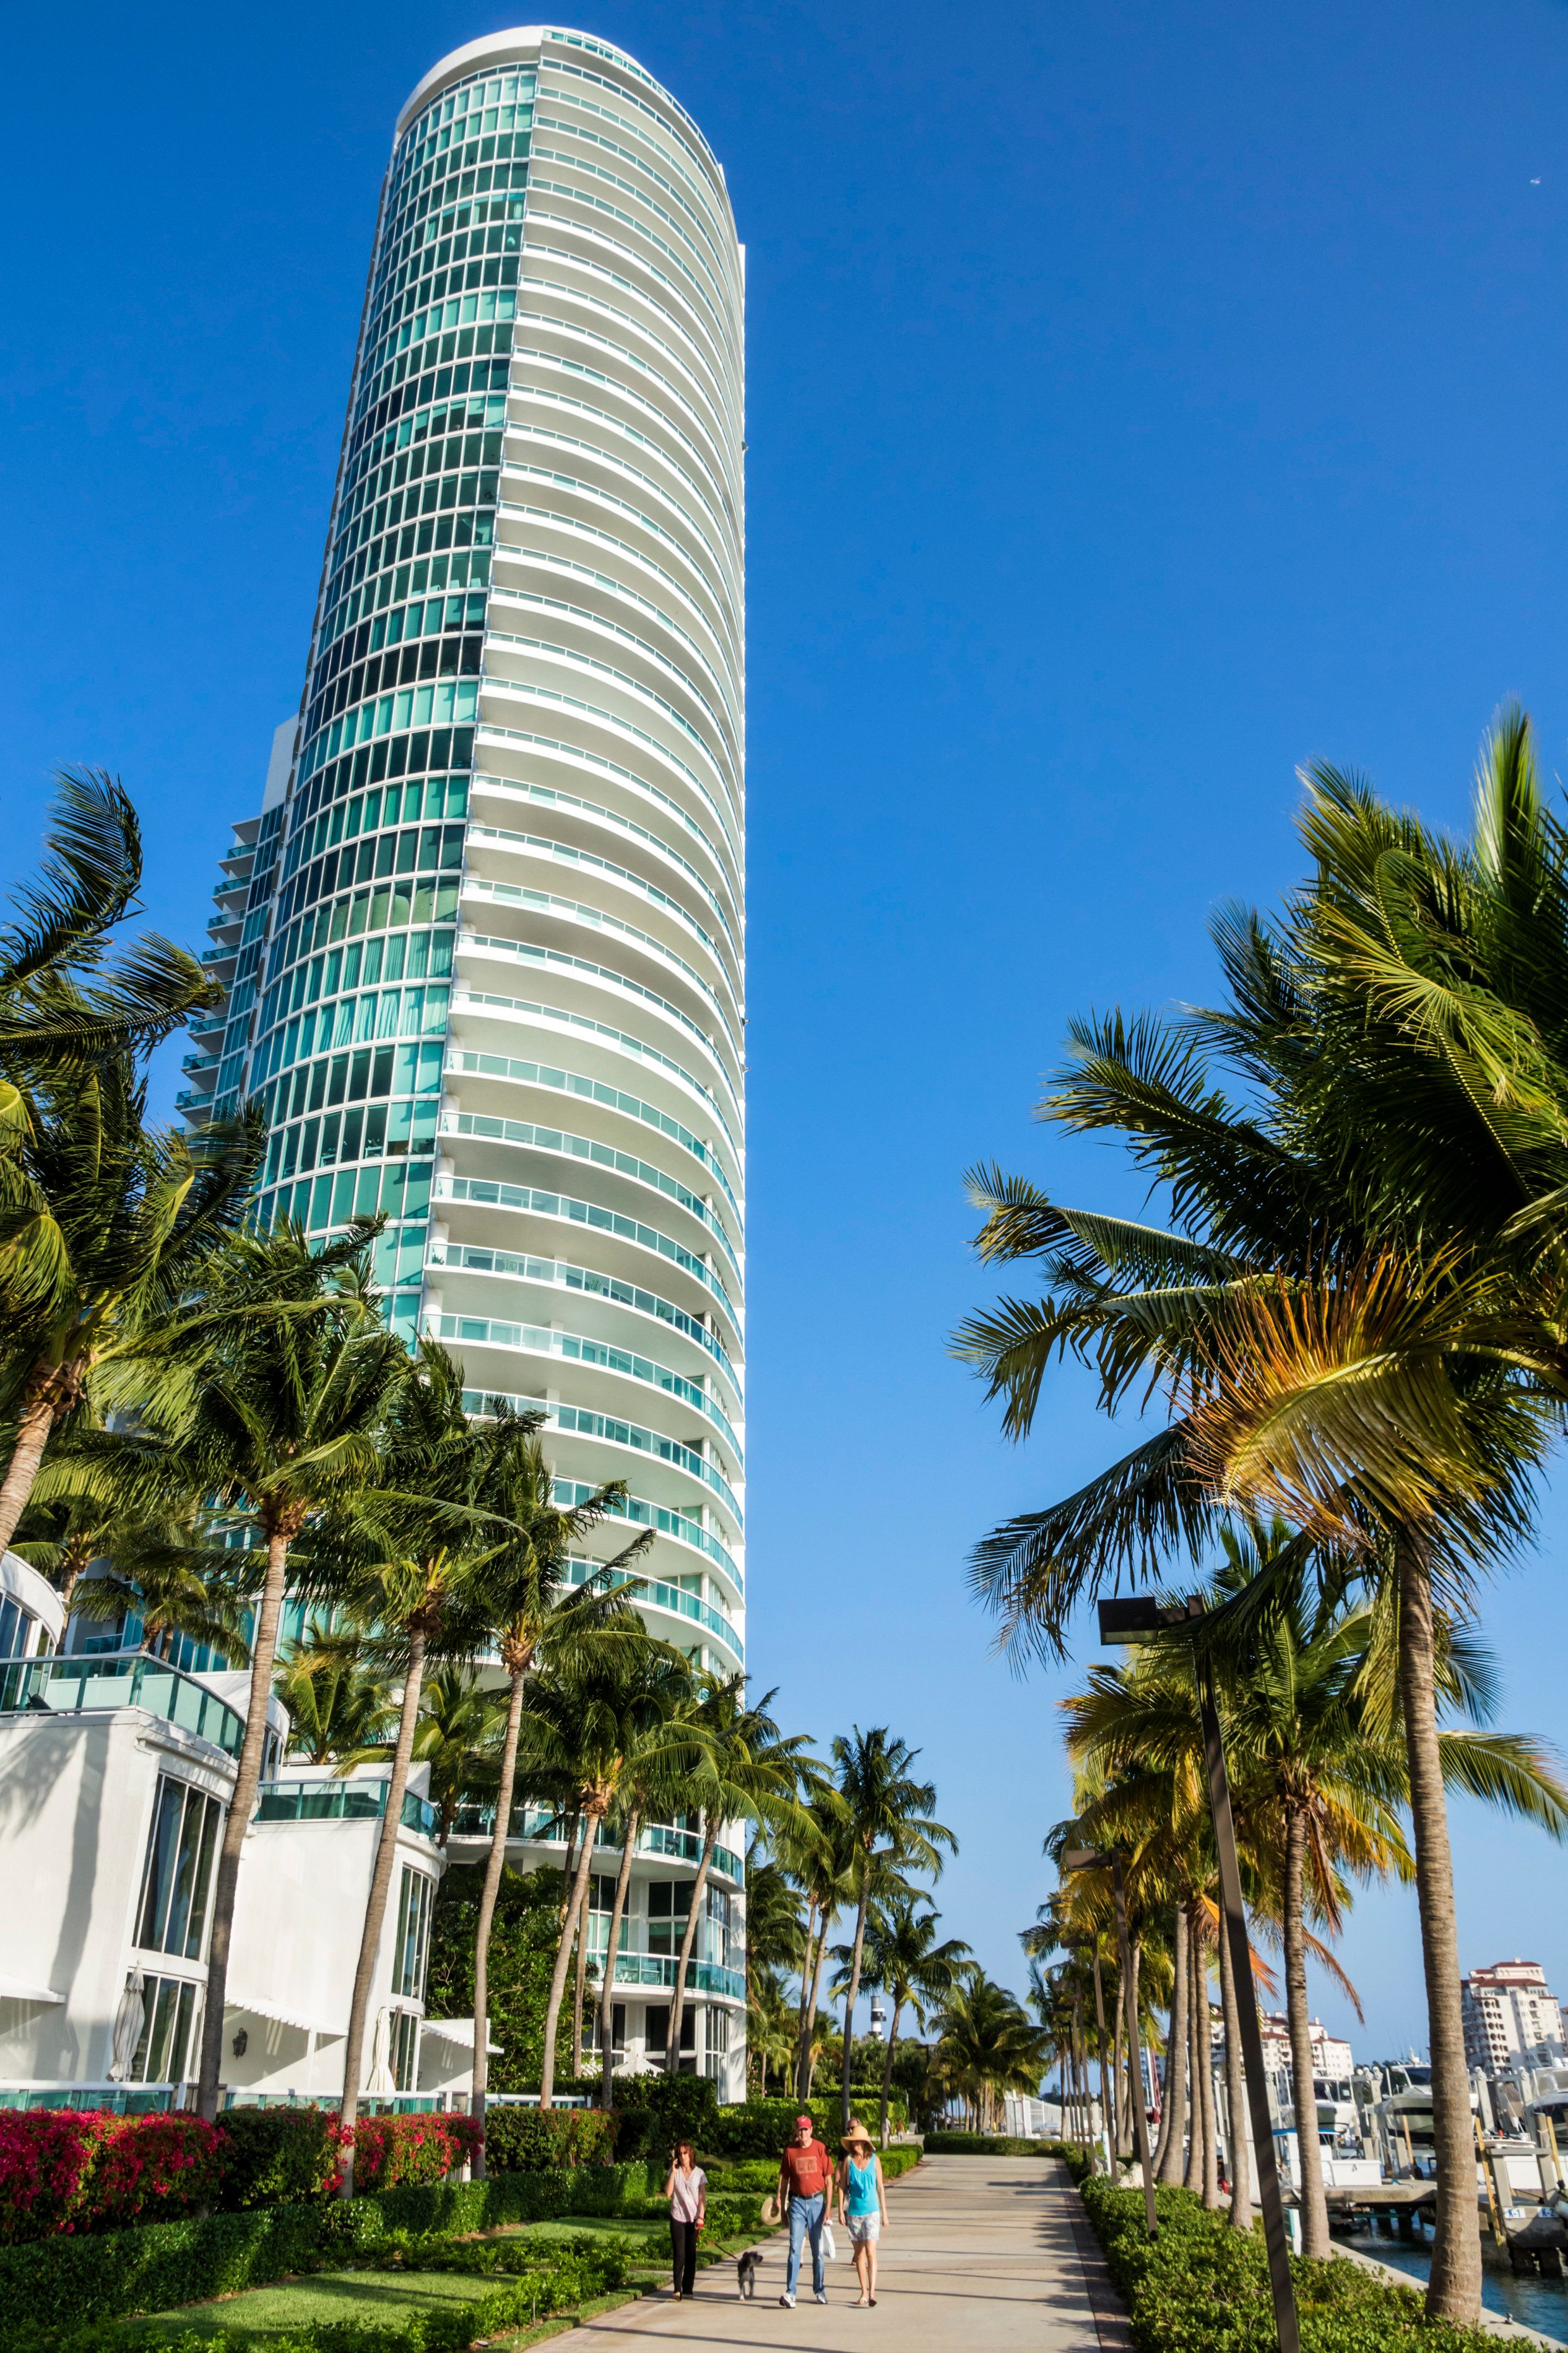 Florida, Miami Beach, Bay Walk, Murano at Portofino. (Photo by: Jeffrey Greenberg/UIG via Getty Images)